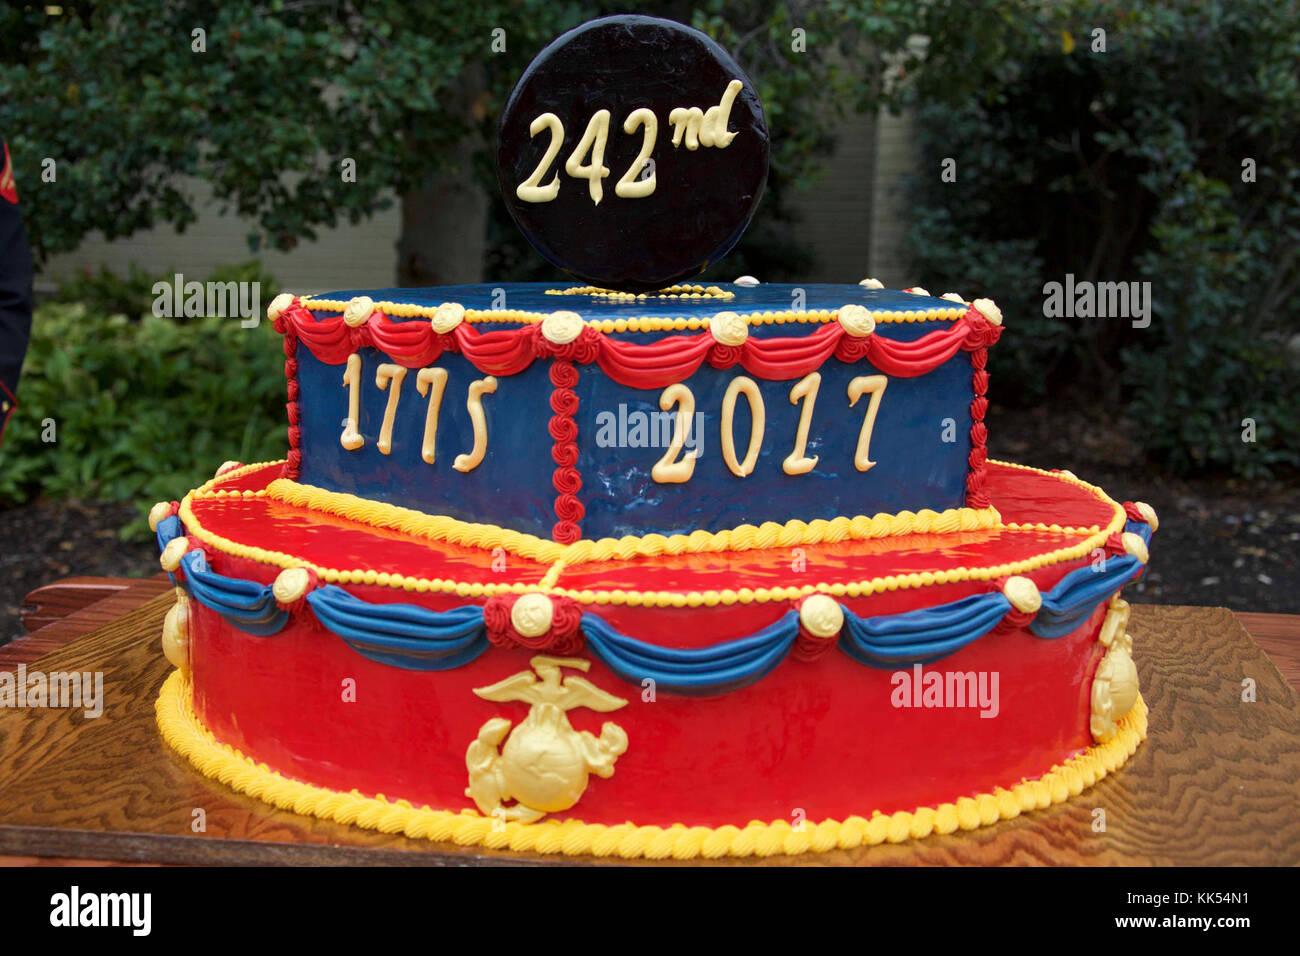 A Cake Is Displayed At A Marine Corps Birthday Ceremony At The Pentagon Arlington Va Nov 9 2017 The Ceremony Was In Honor Of The Corps 242nd Birthday U S Marine Corps Photo